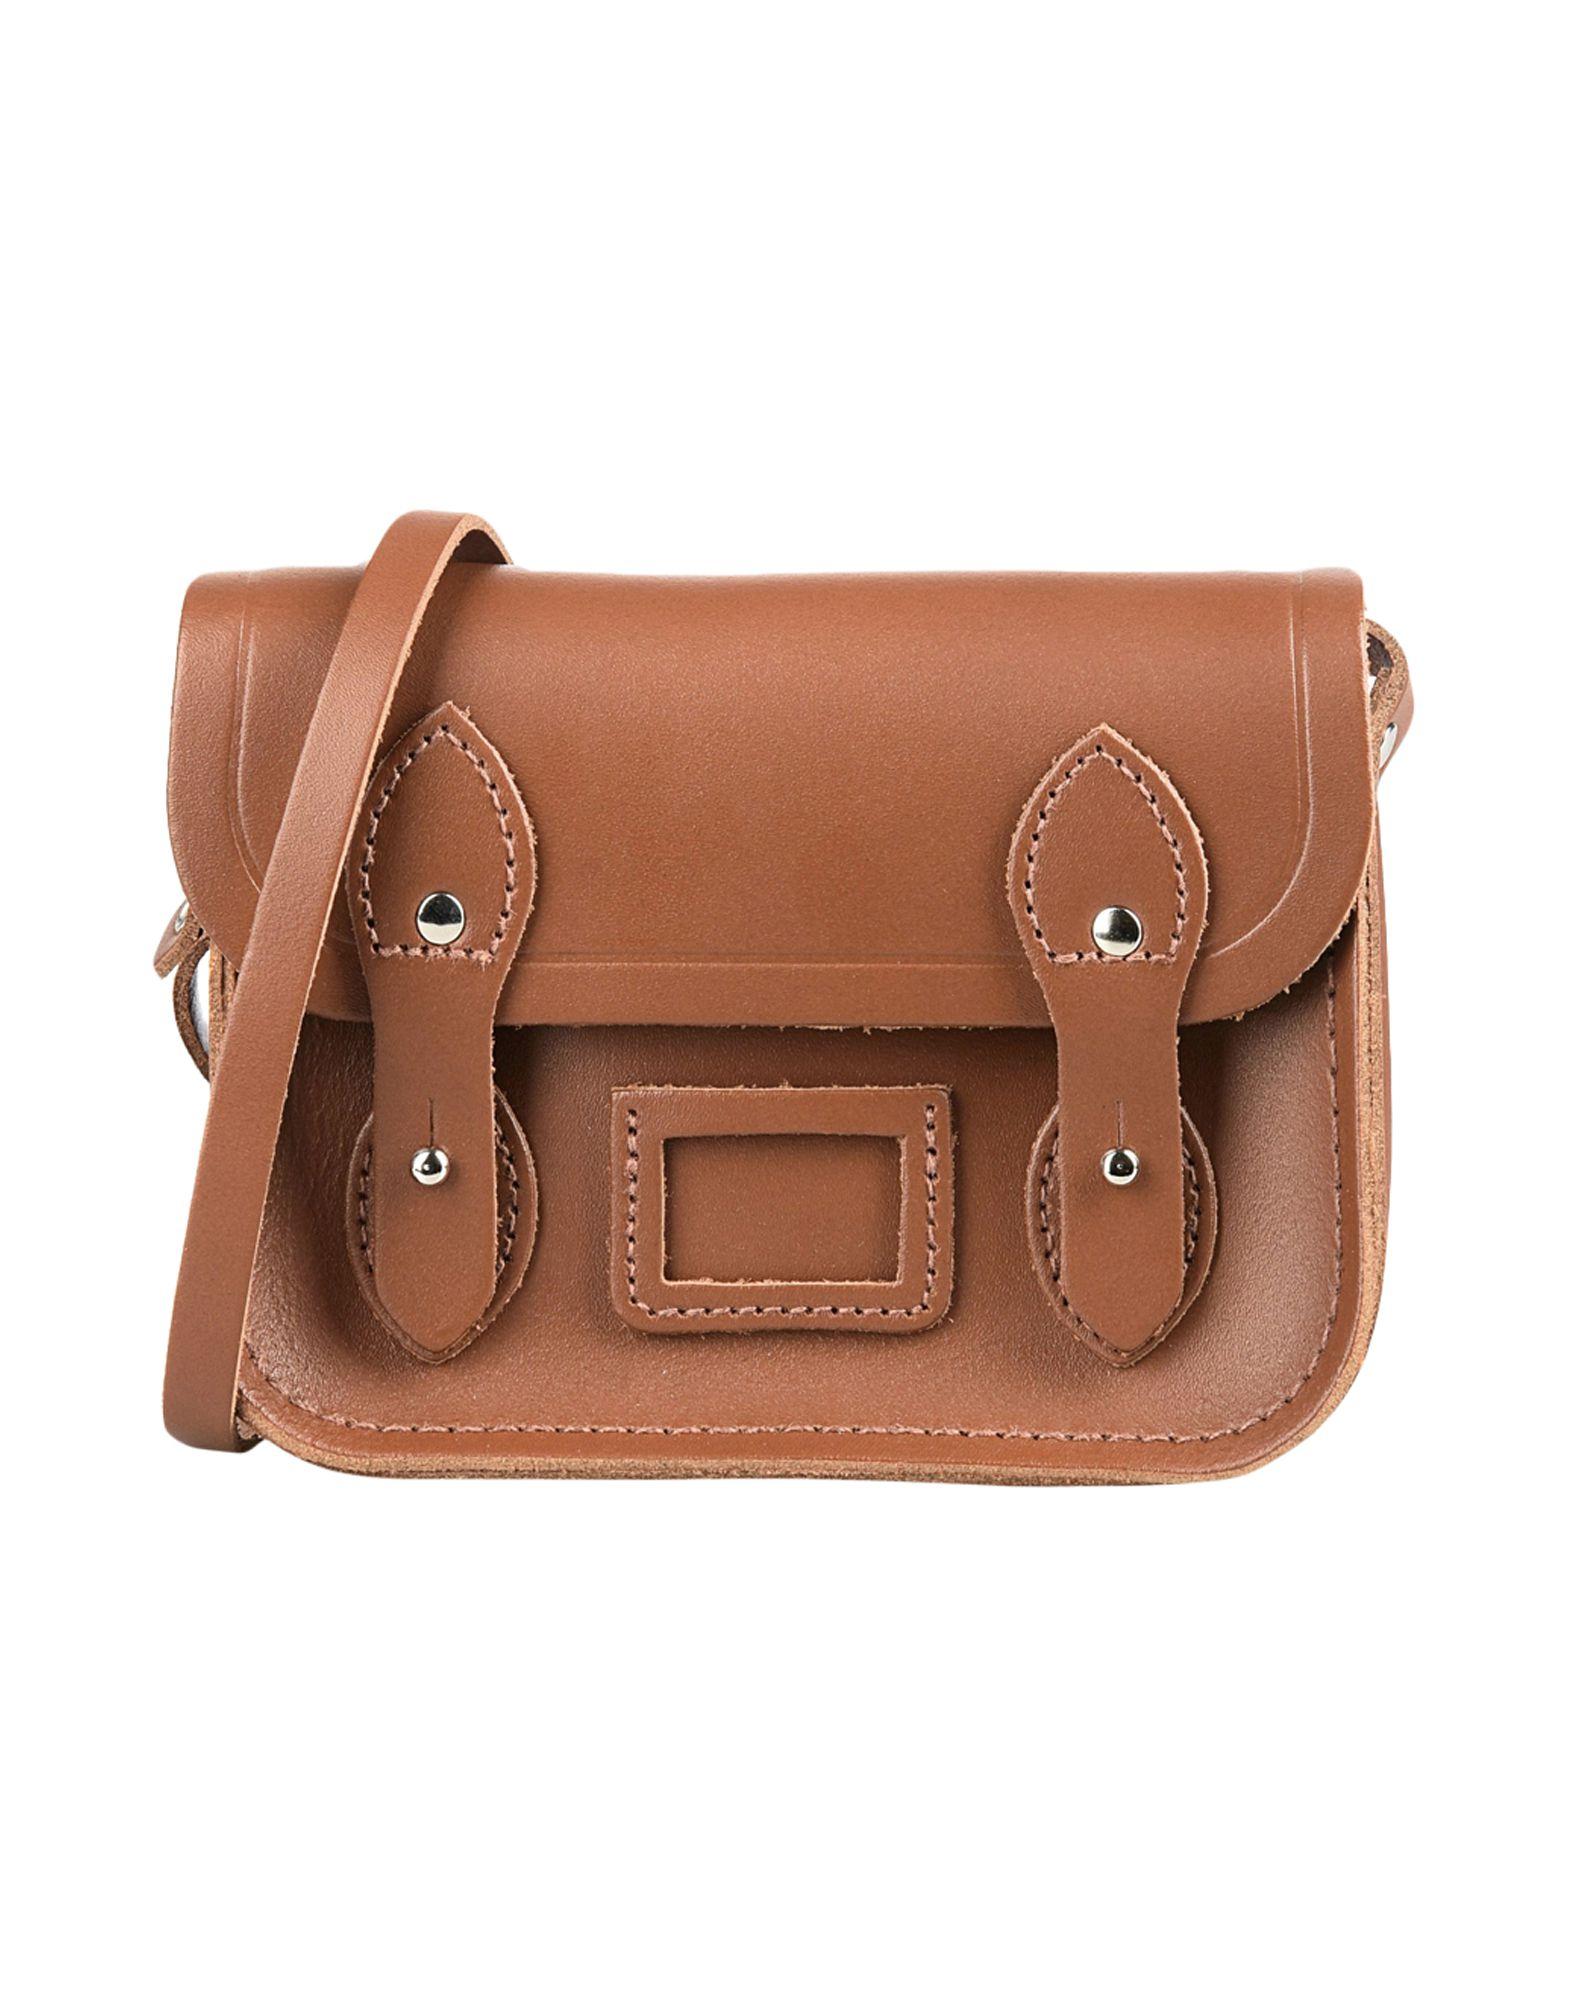 The Cambridge Satchel Company Tiny Handbag Women Handbags Online On Yoox United States 45332523au